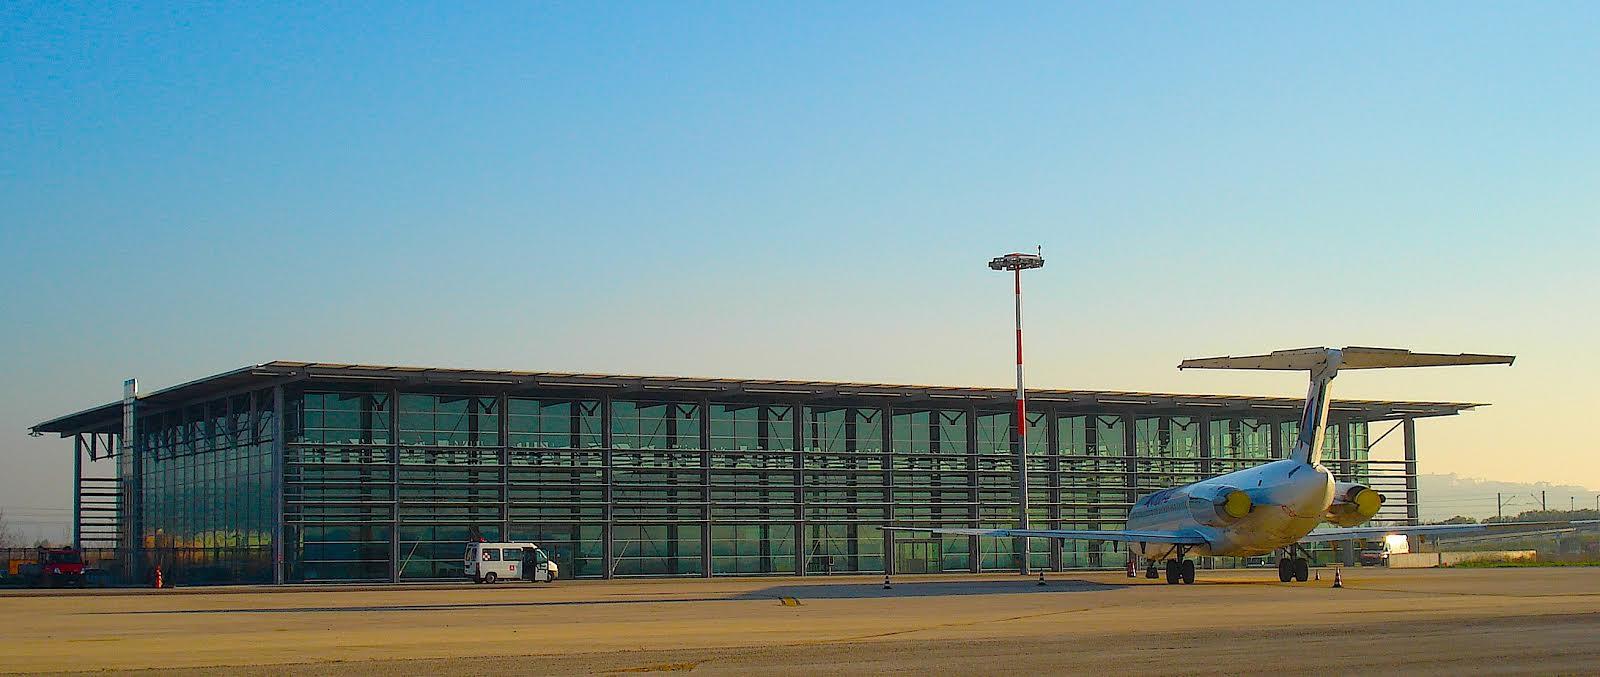 Aeroporto Sharm : Da ancona voli aerei per sharm e zara cronache maceratesi